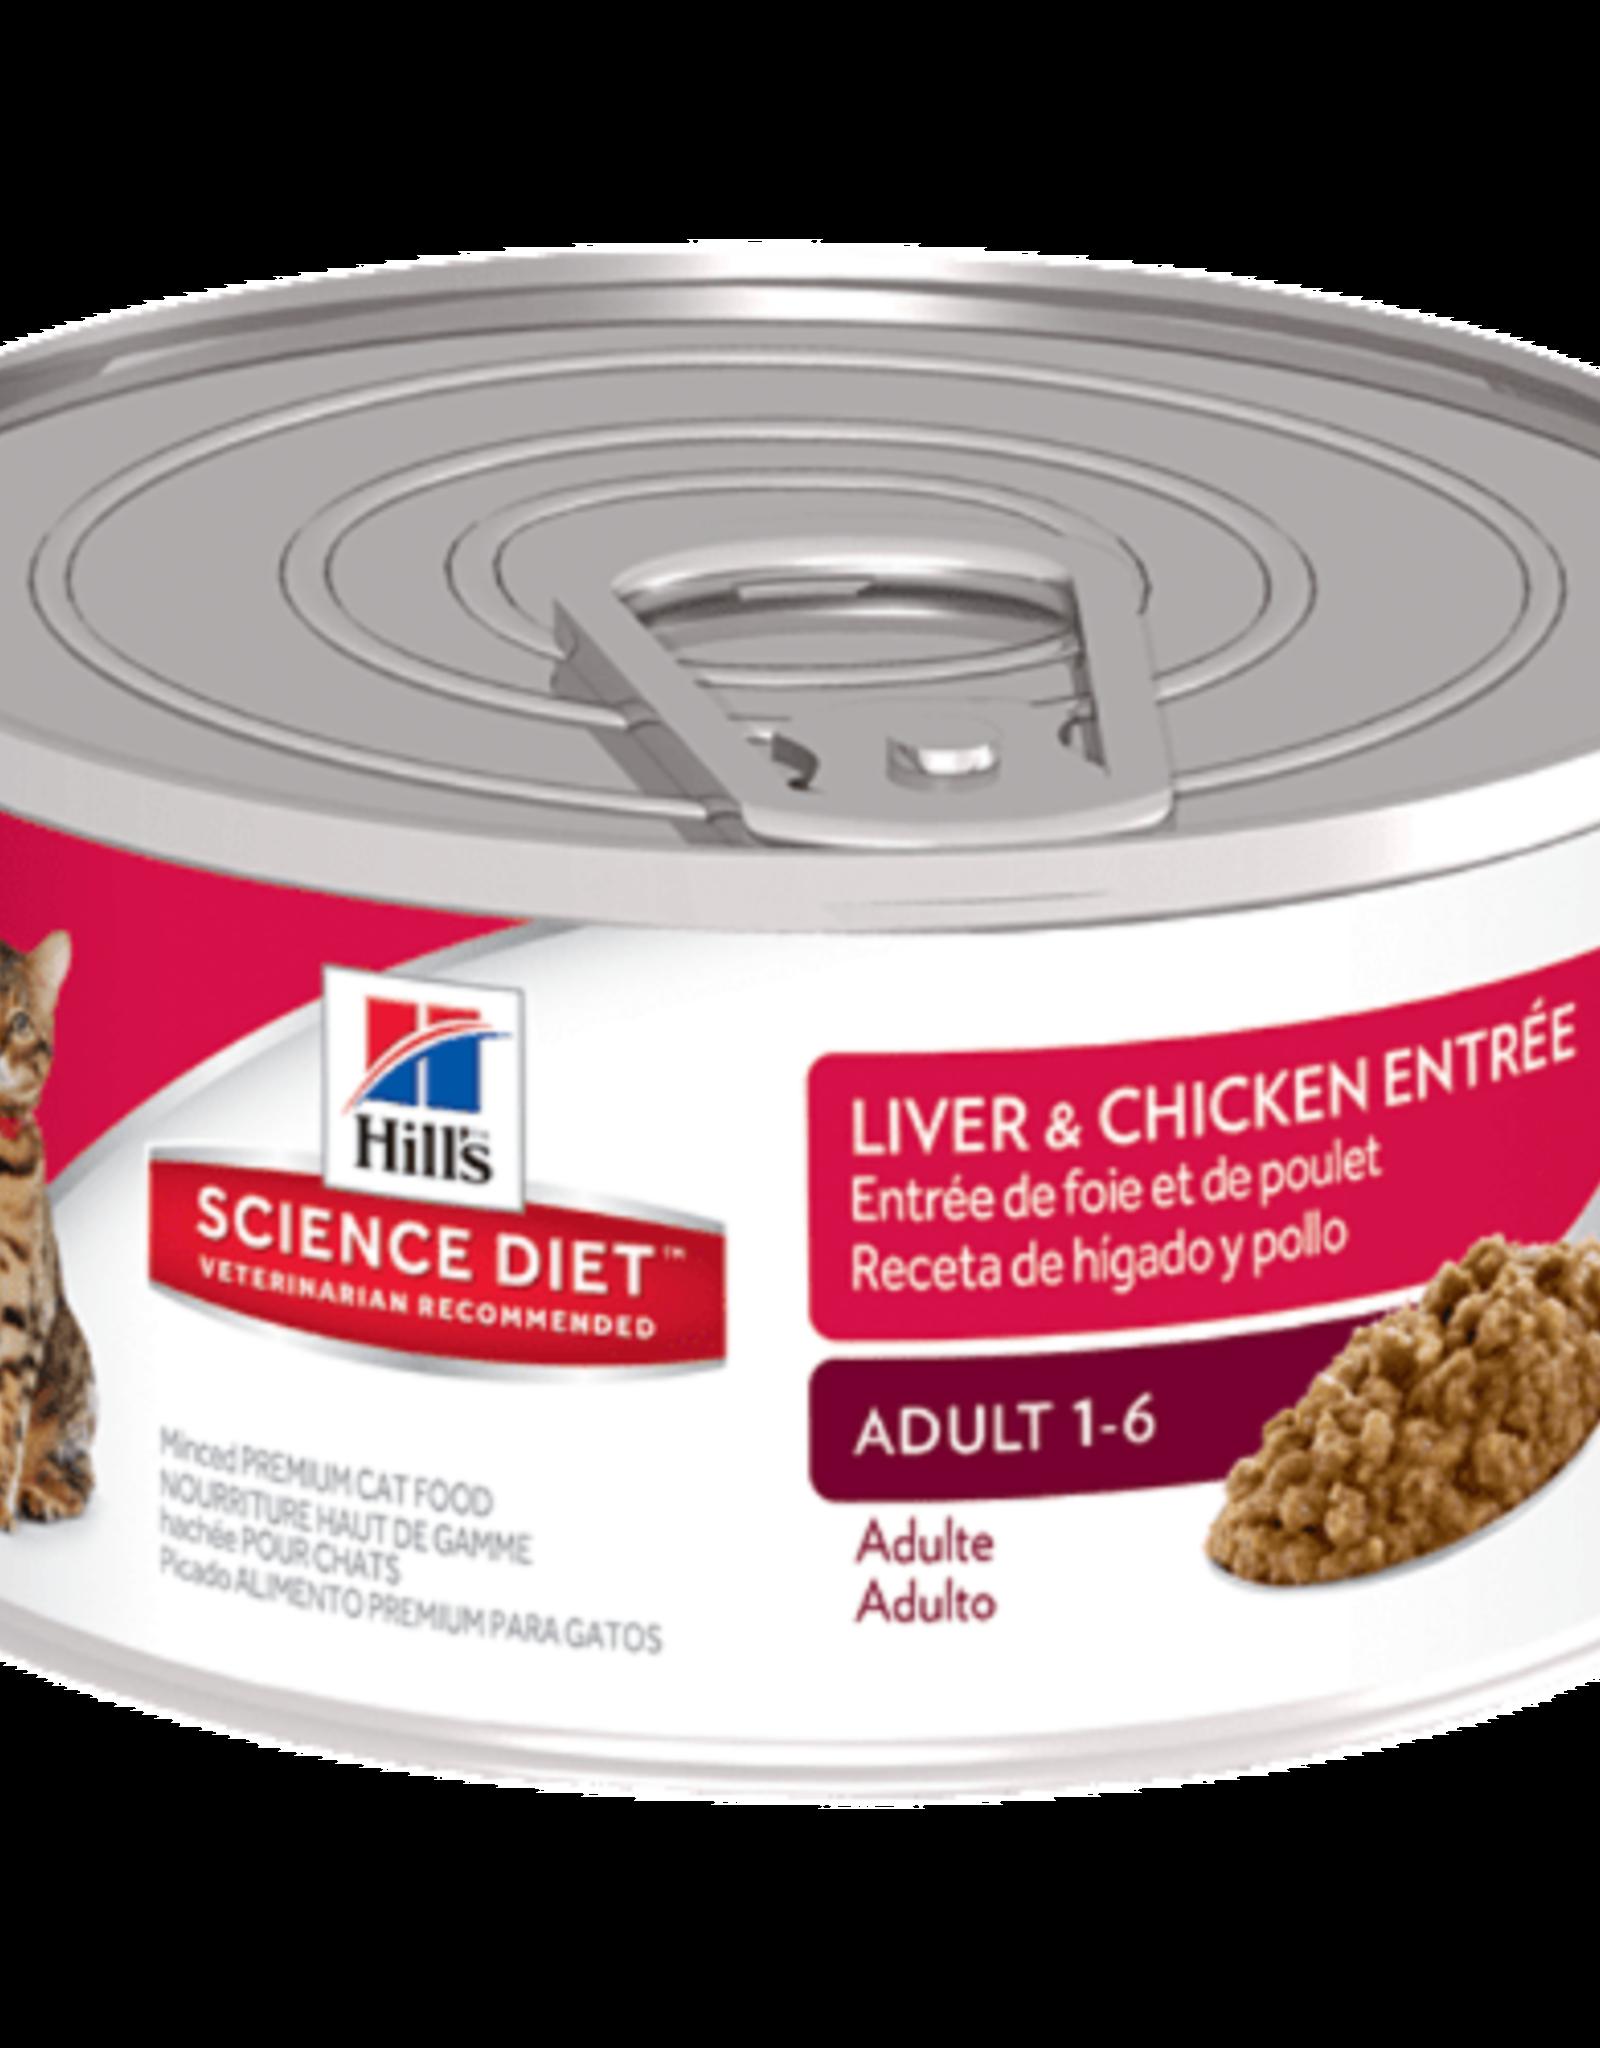 SCIENCE DIET HILL'S SCIENCE DIET FELINE CAN ADULT LIVER & CHICKEN 2.9OZ